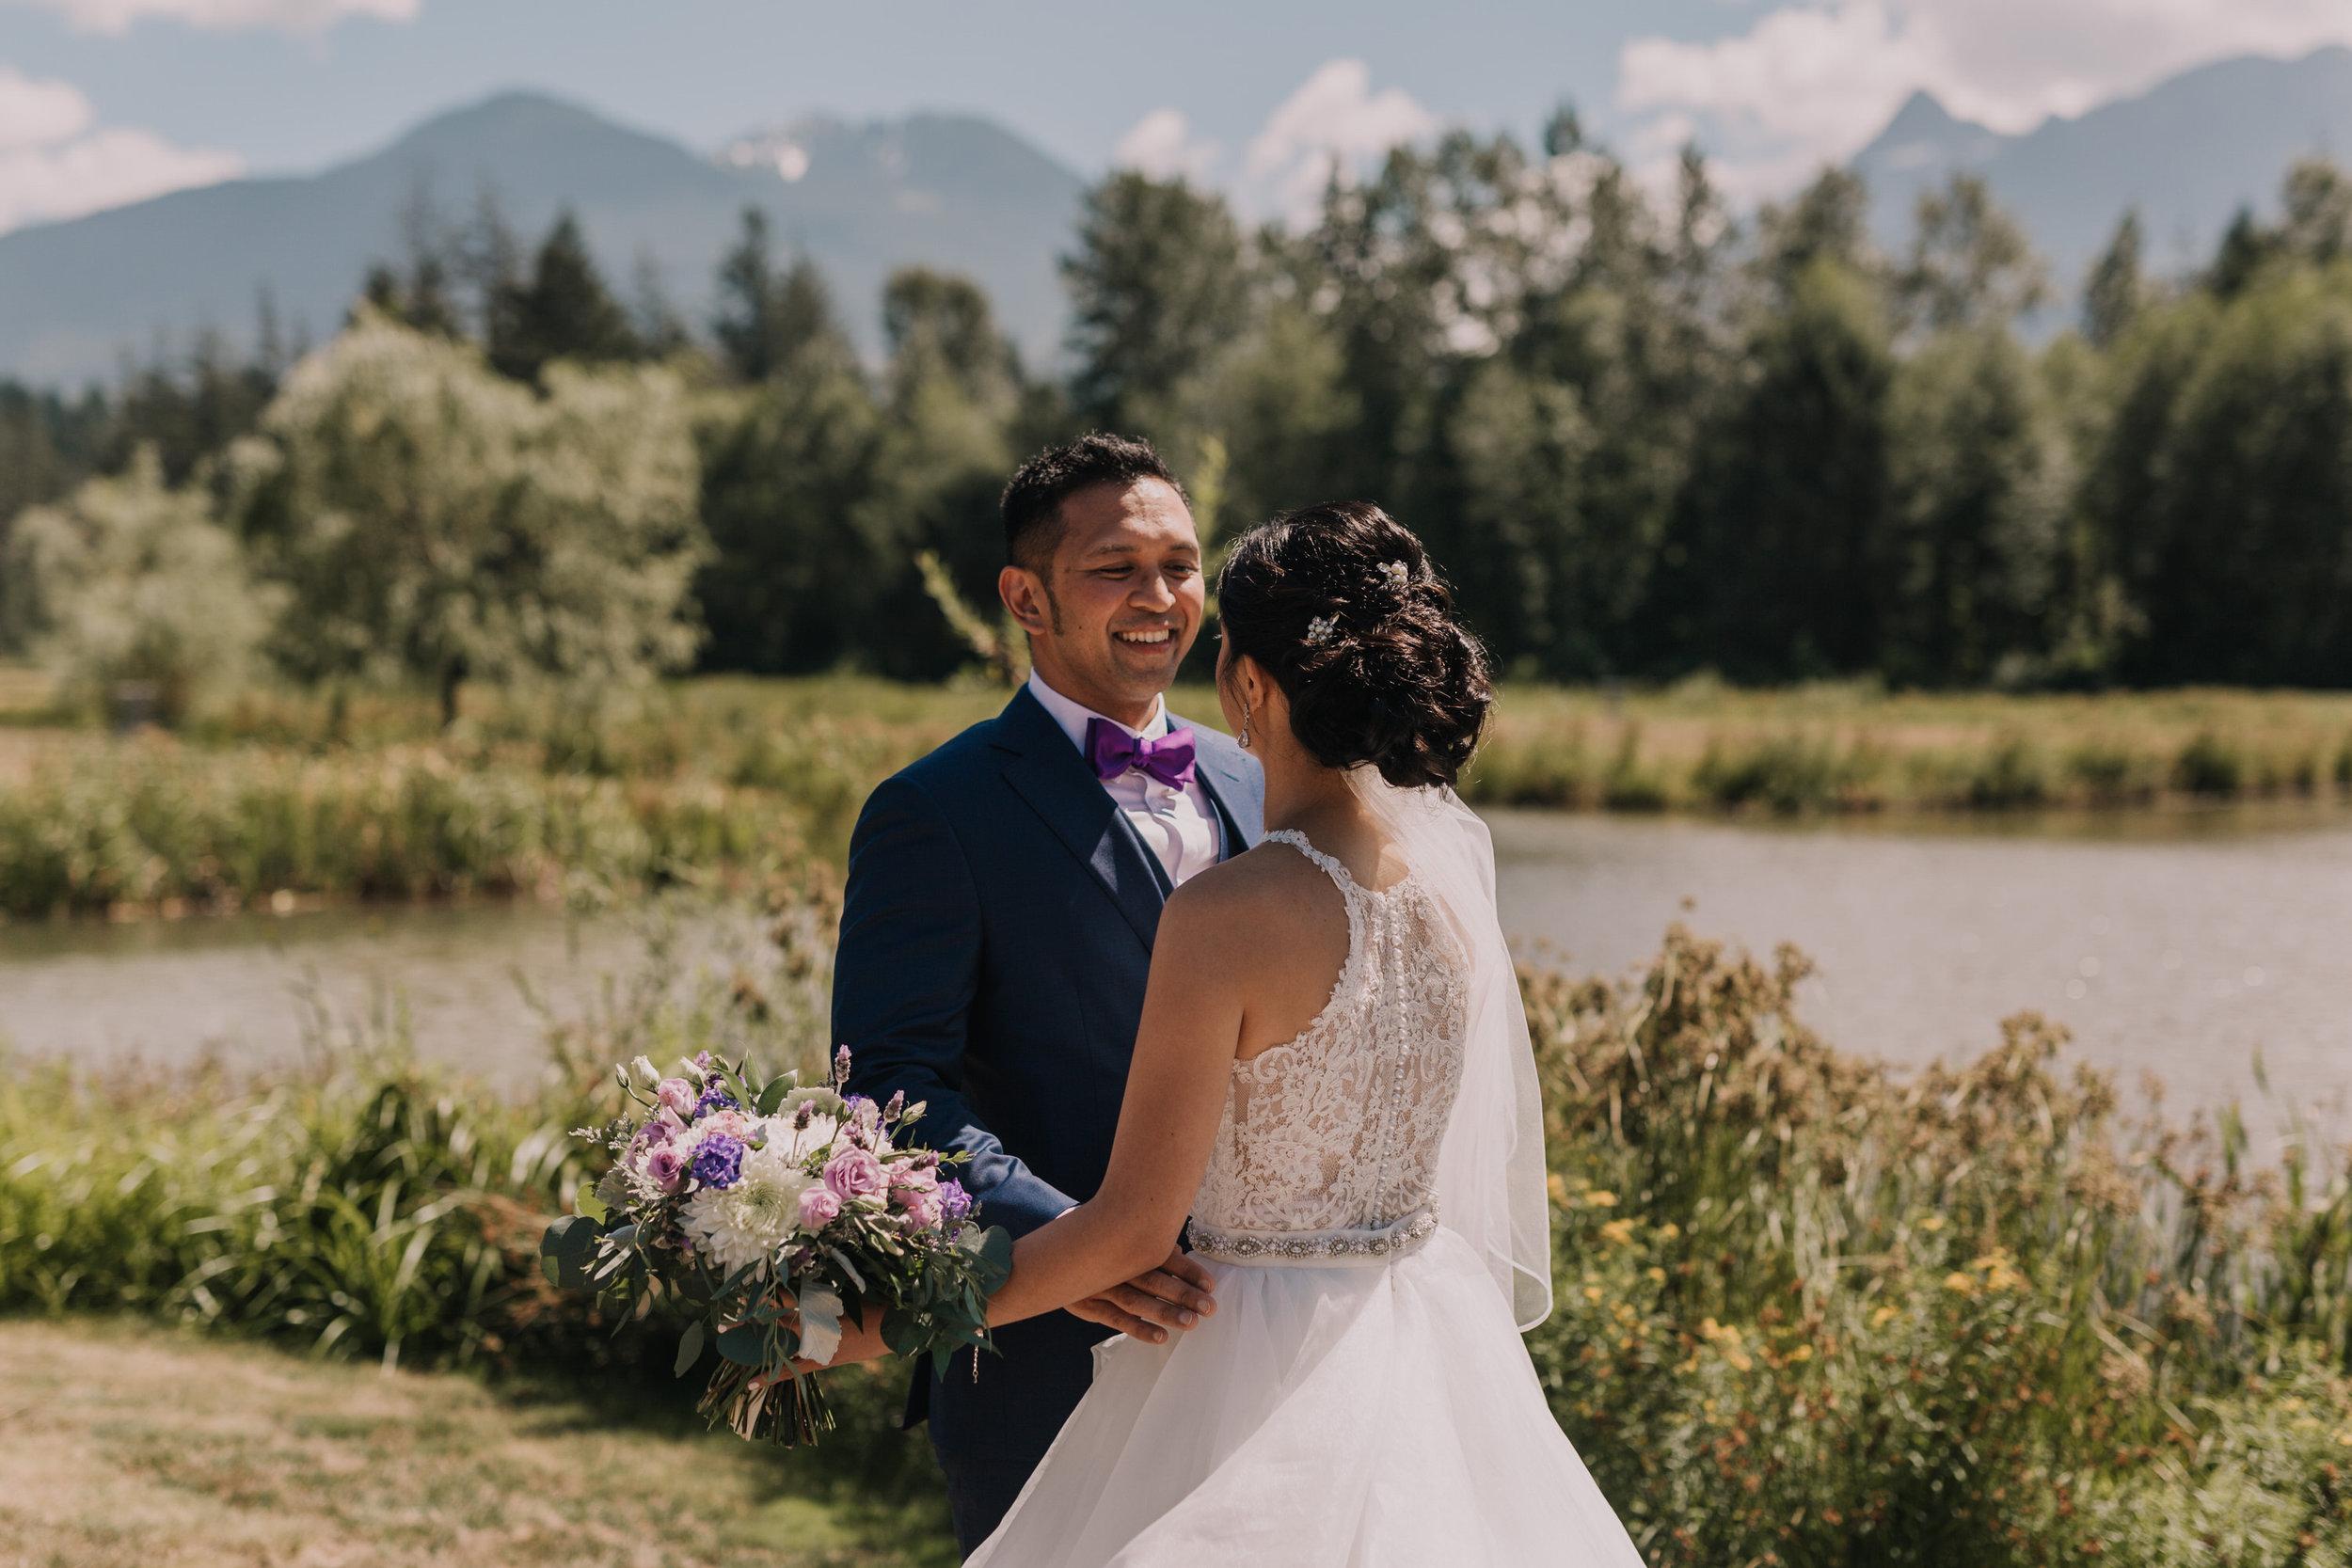 Squamish Wedding Photographer - Sea to Sky Gondola Wedding Photos -  Vancouver Wedding Photographer & Videographer - Sunshine Coast Wedding Photos - Sunshine Coast Wedding Photographer - Jennifer Picard Photography - IMG_2169_1.jpg